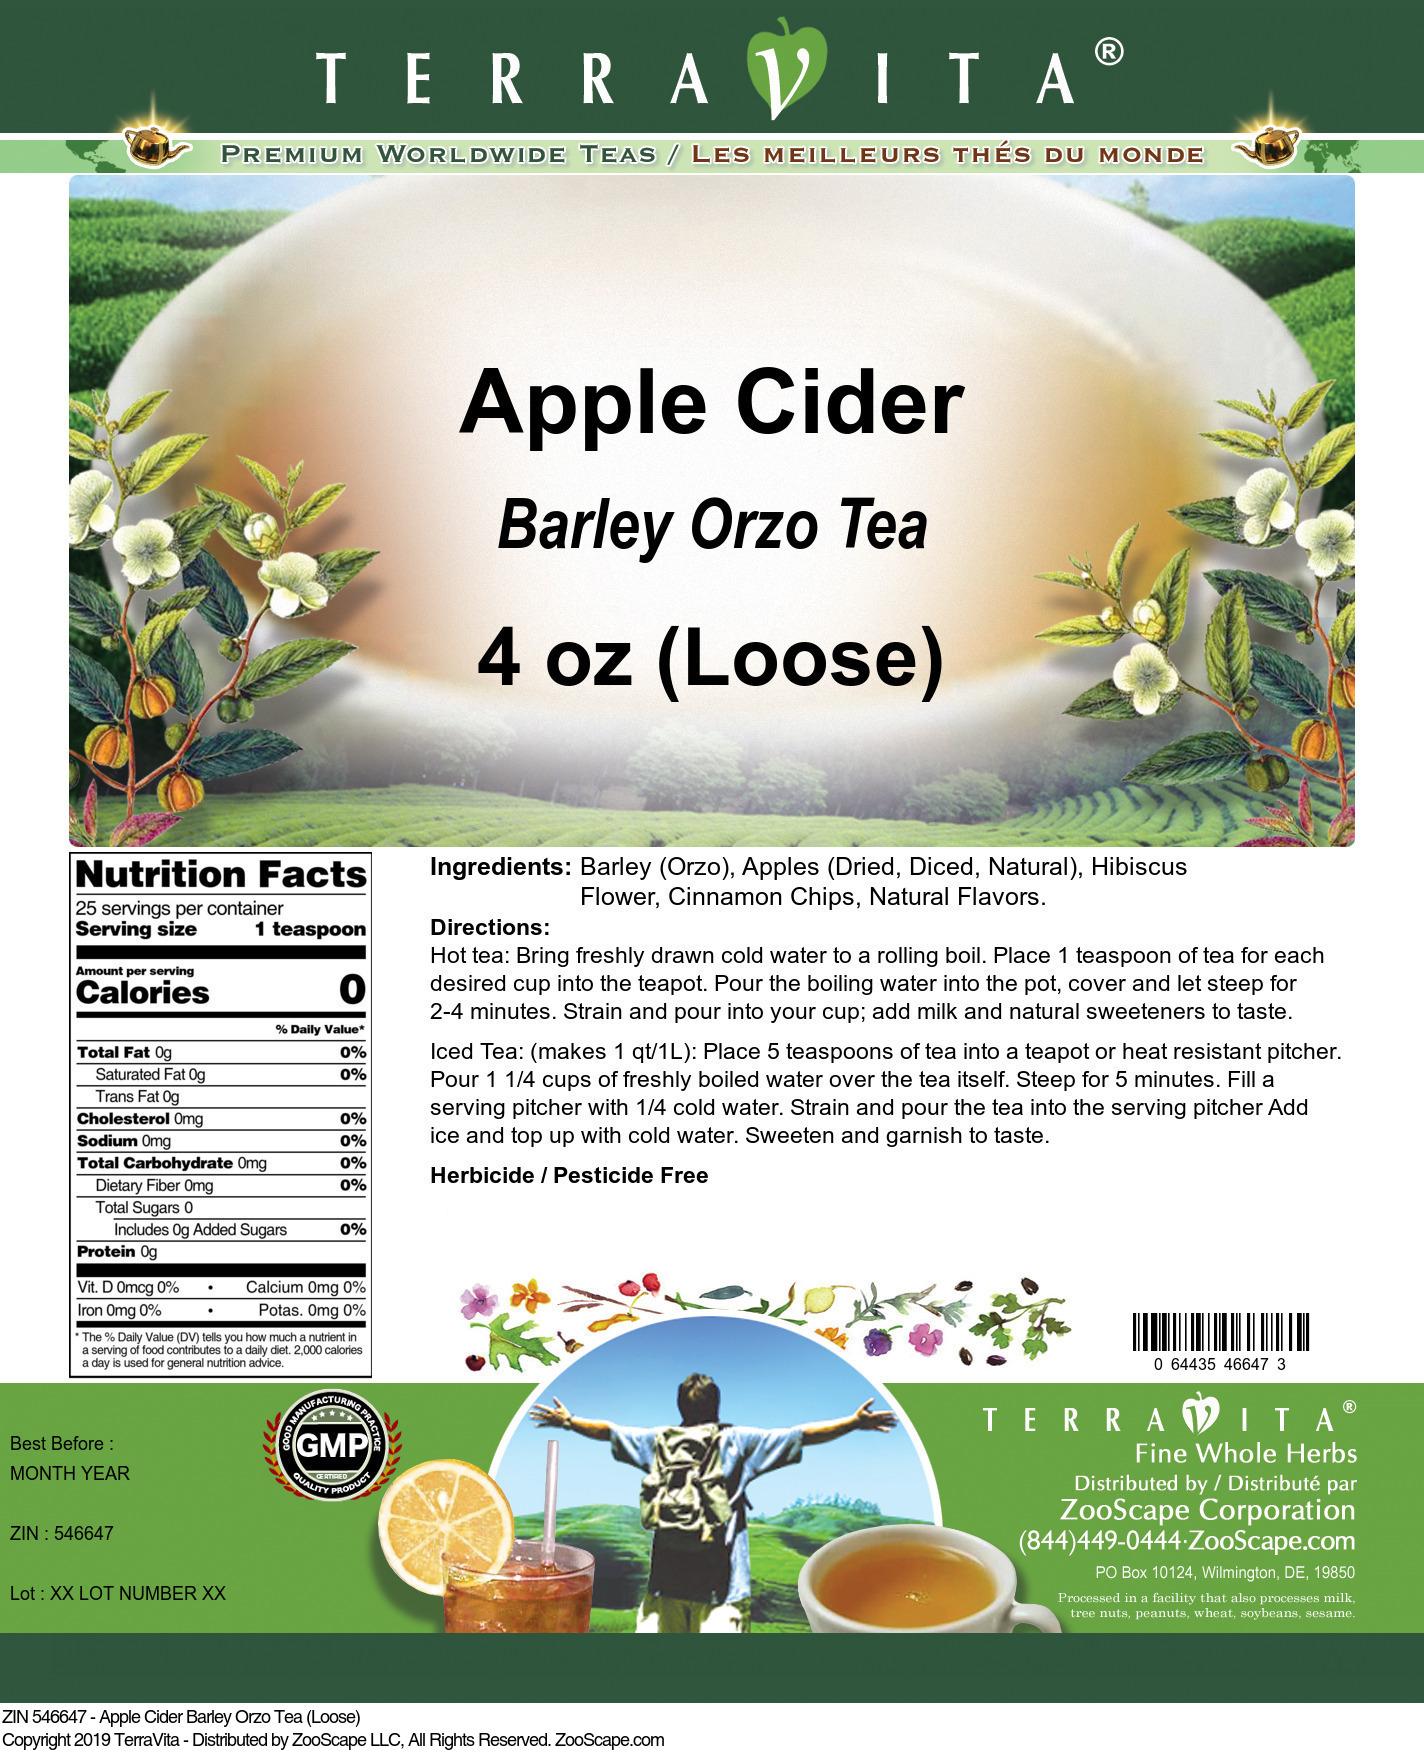 Apple Cider Barley Orzo Tea (Loose)